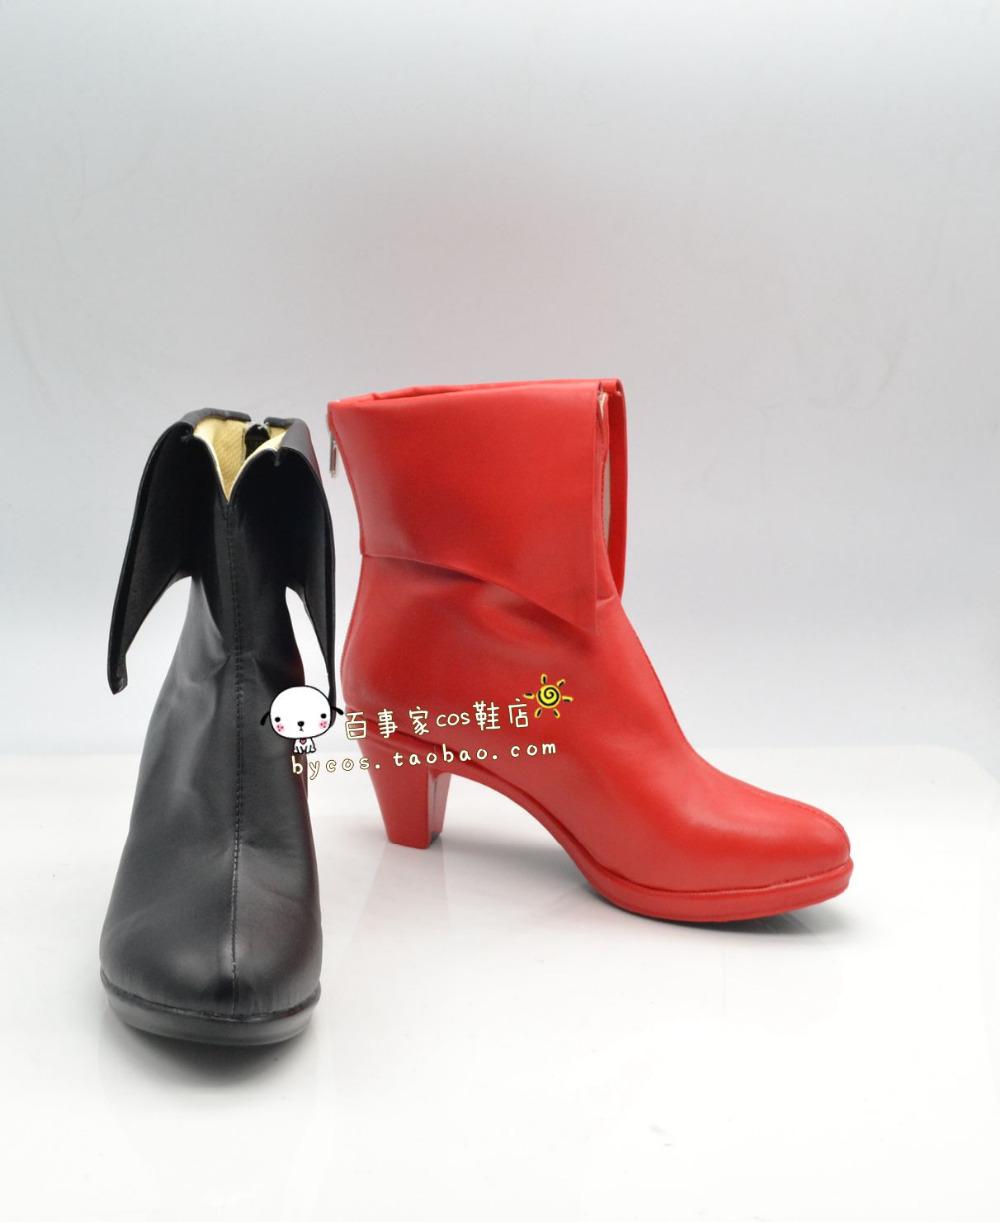 Harley Quinn High Heel Shoes